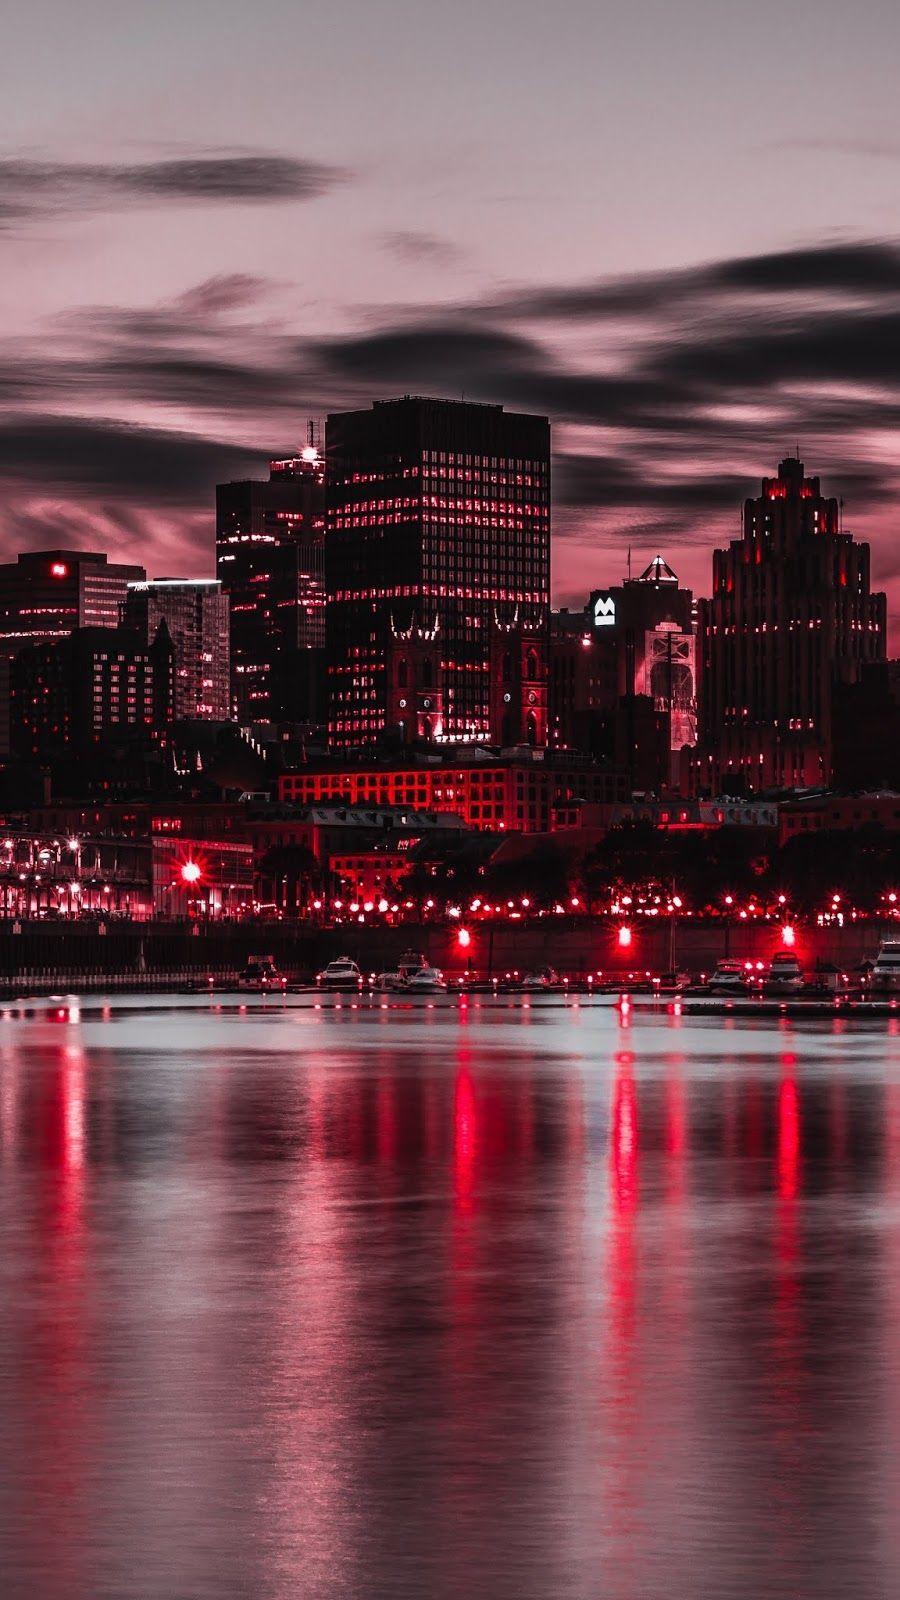 Night City City Lights Buildings City Wallpaper City Lights Wallpaper Cityscape Wallpaper